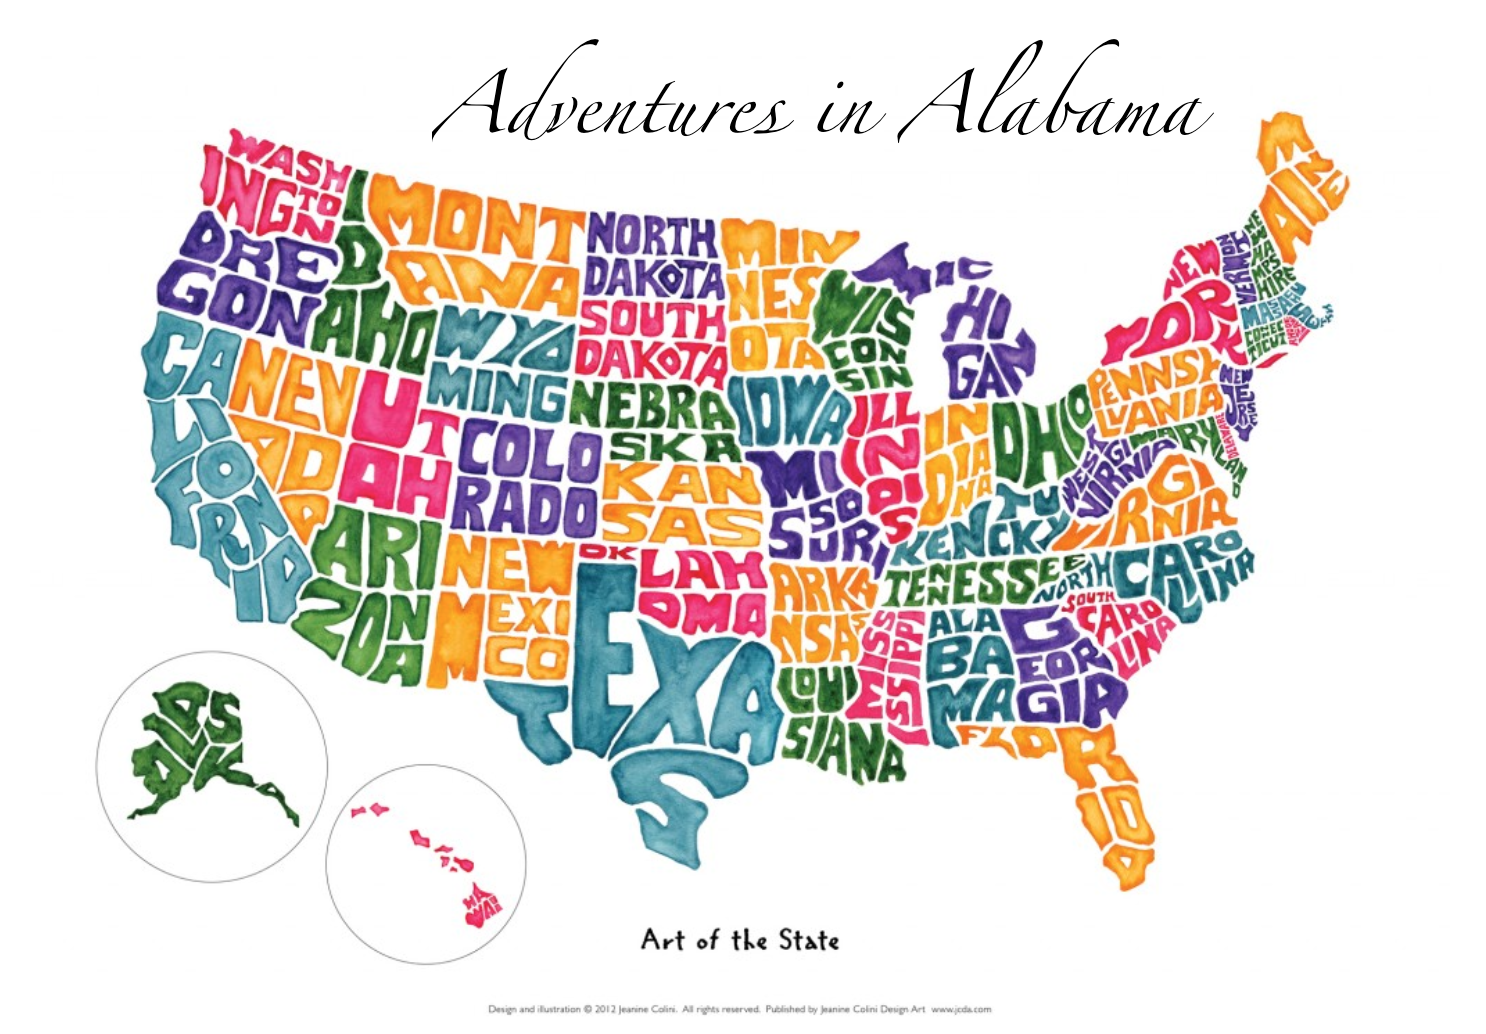 Adventures in Alabama